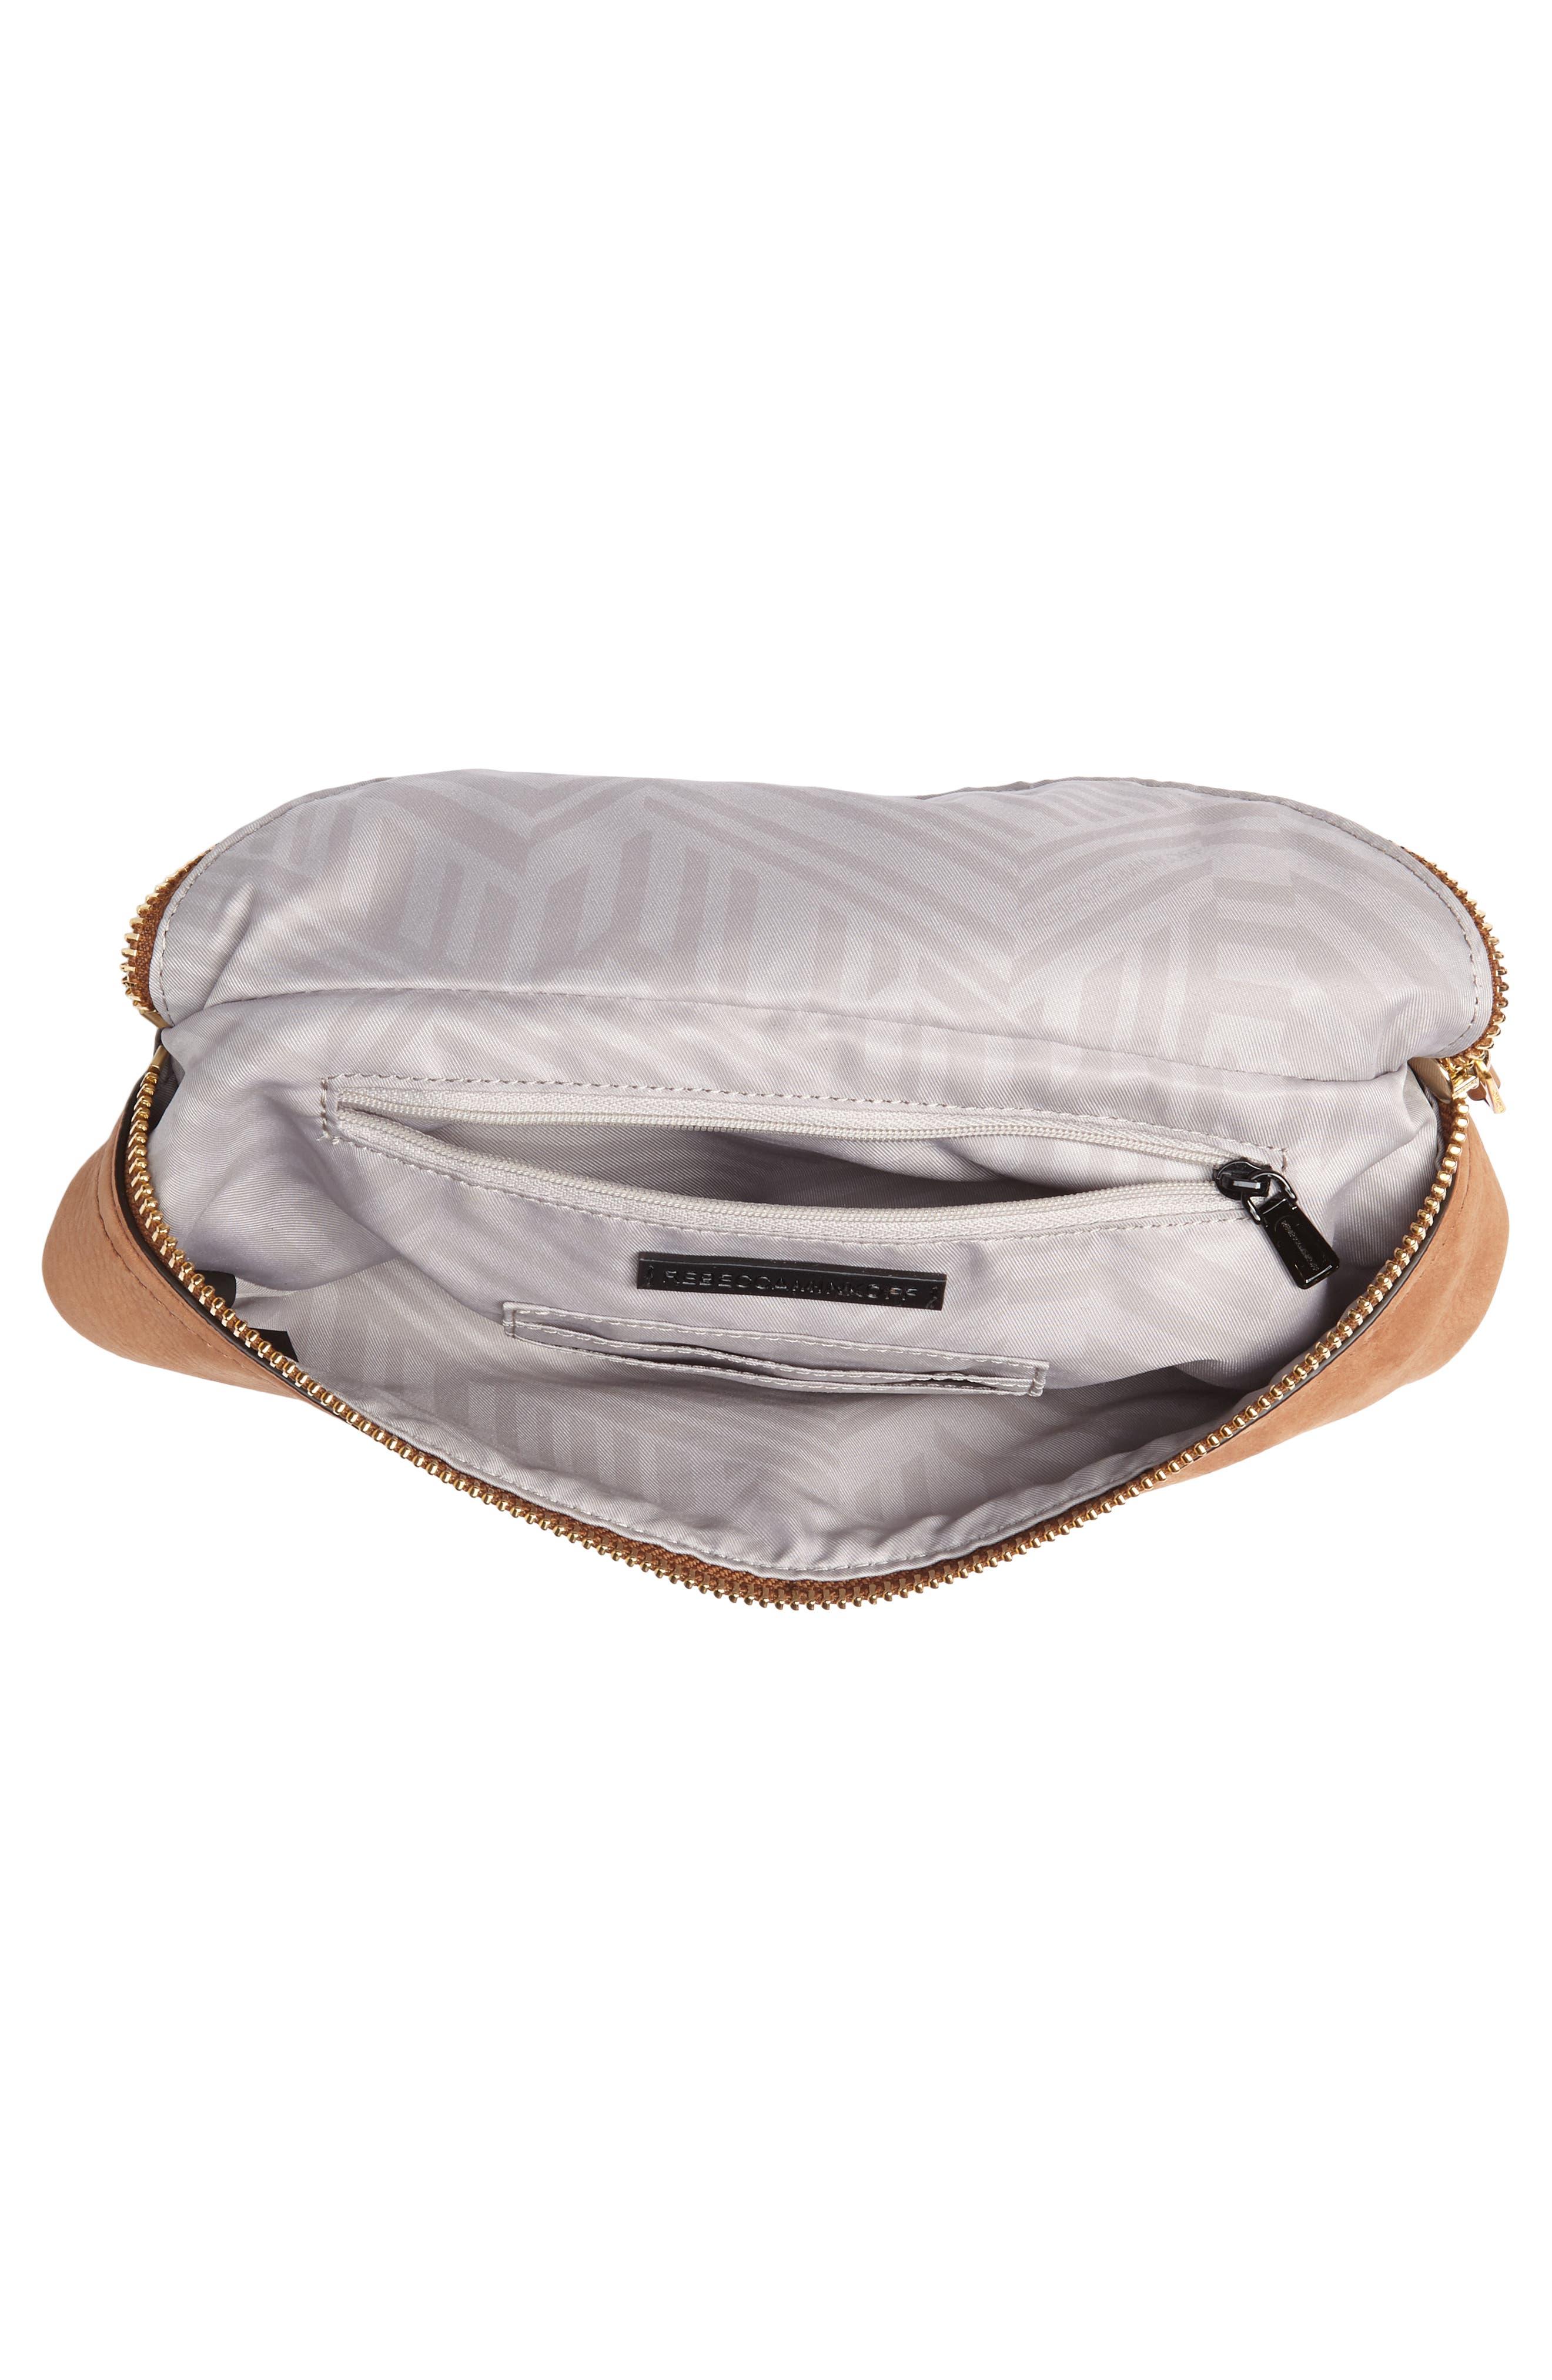 Bree Leather Belt Bag,                             Alternate thumbnail 4, color,                             230